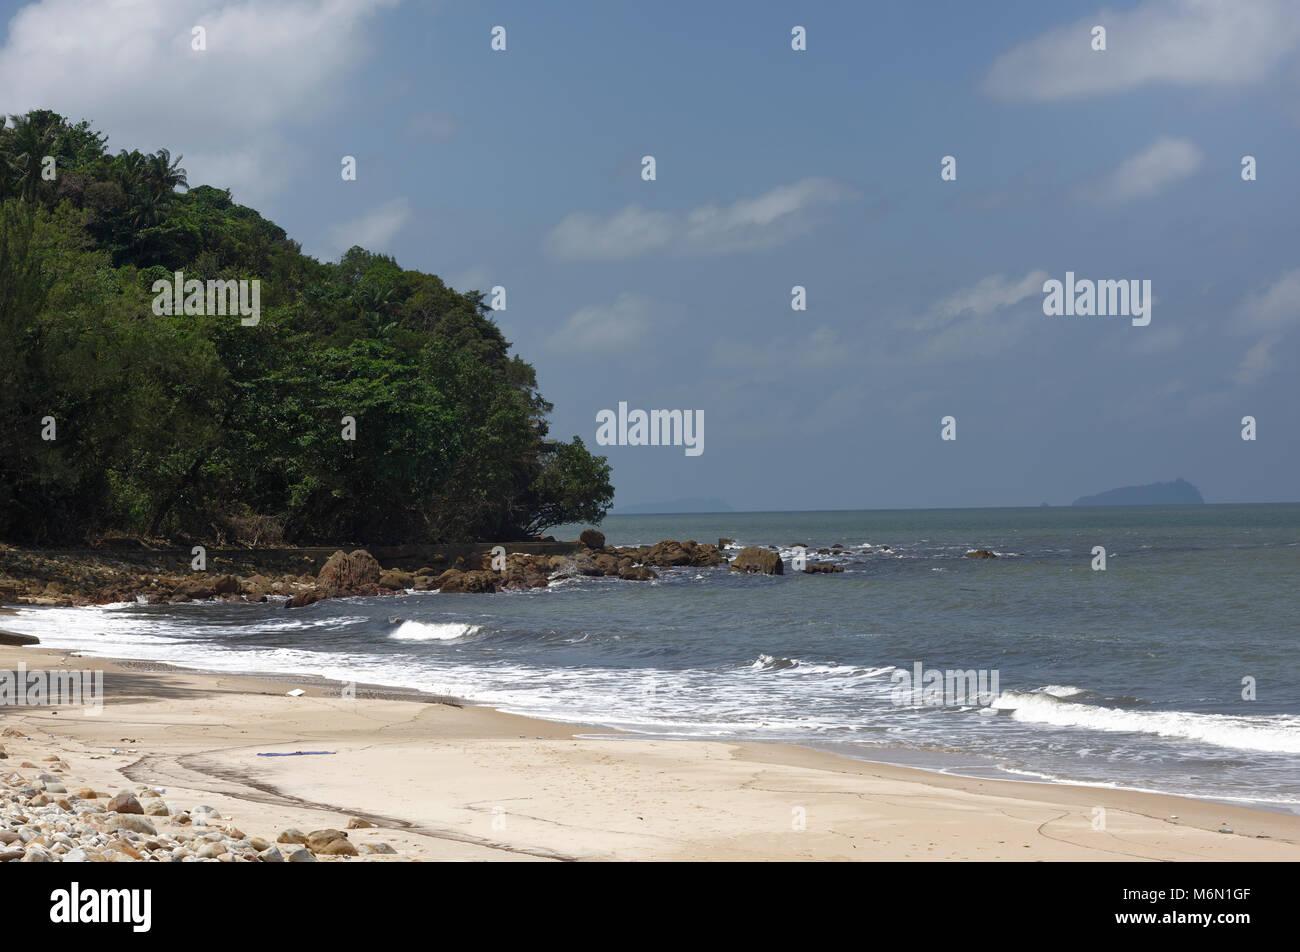 Damai Beach, facing the South China Sea, Kuching, Sarawak, Malaysia - Stock Image